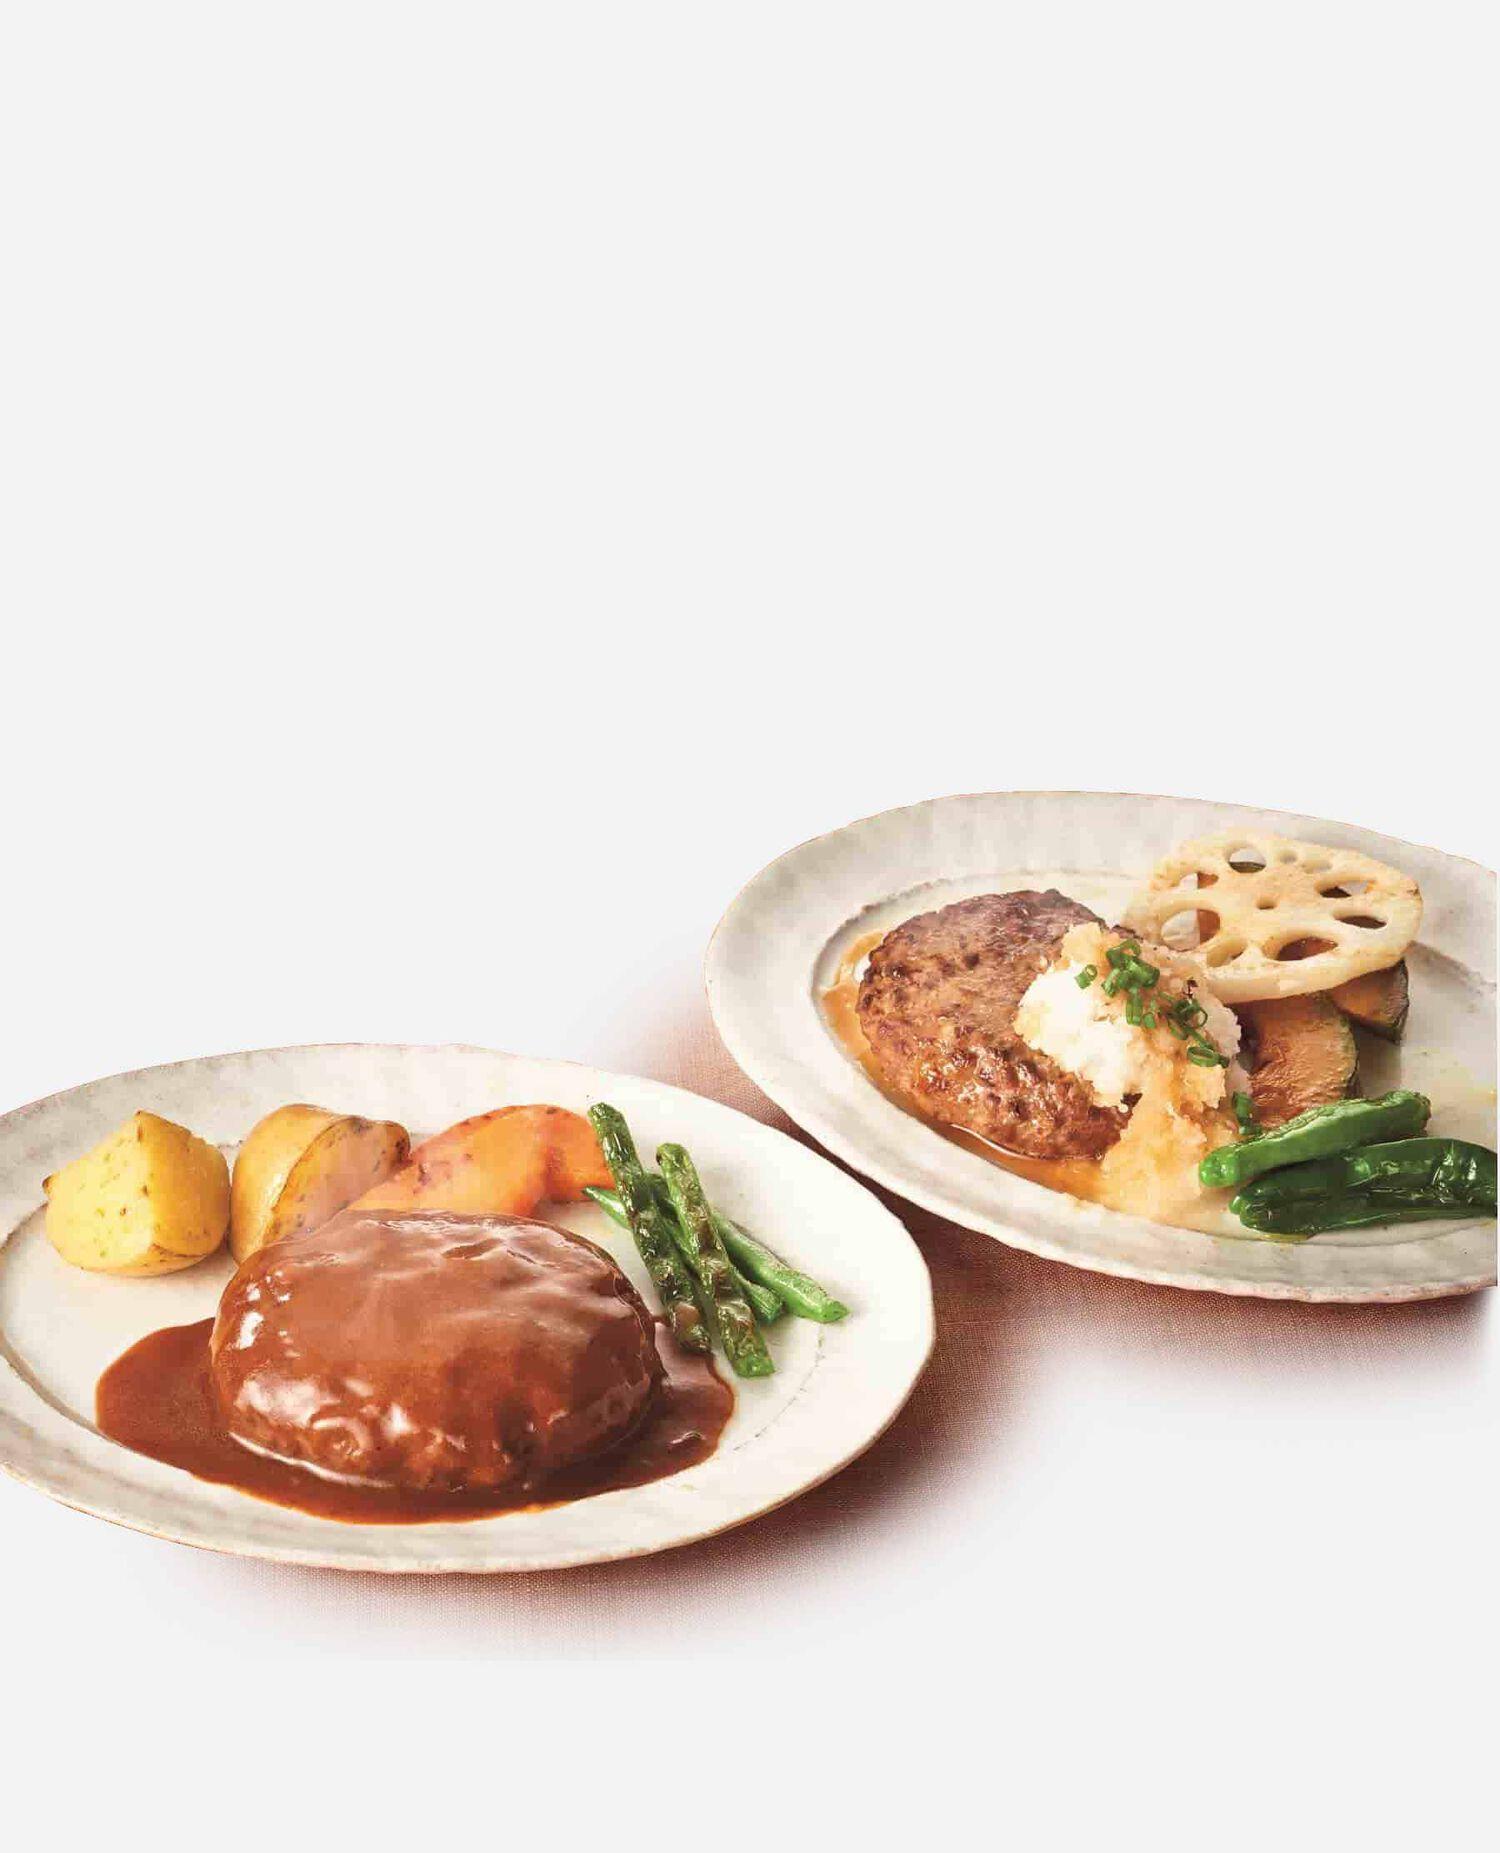 DPH50近江牛ハンバーグ粗挽き・二度挽き食べくらべセット